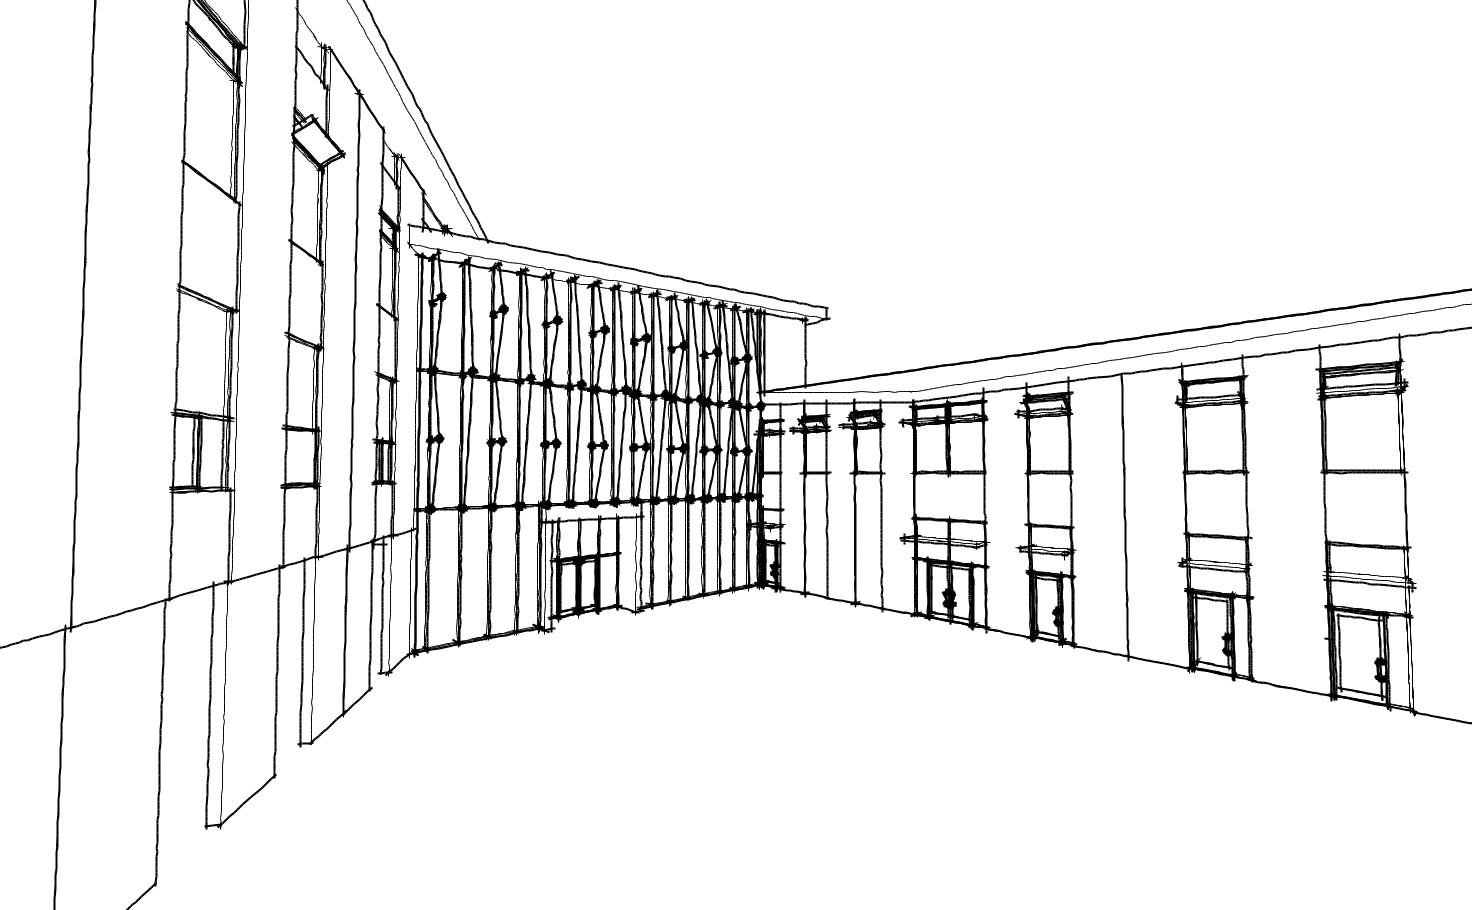 courtyard doodle.jpg